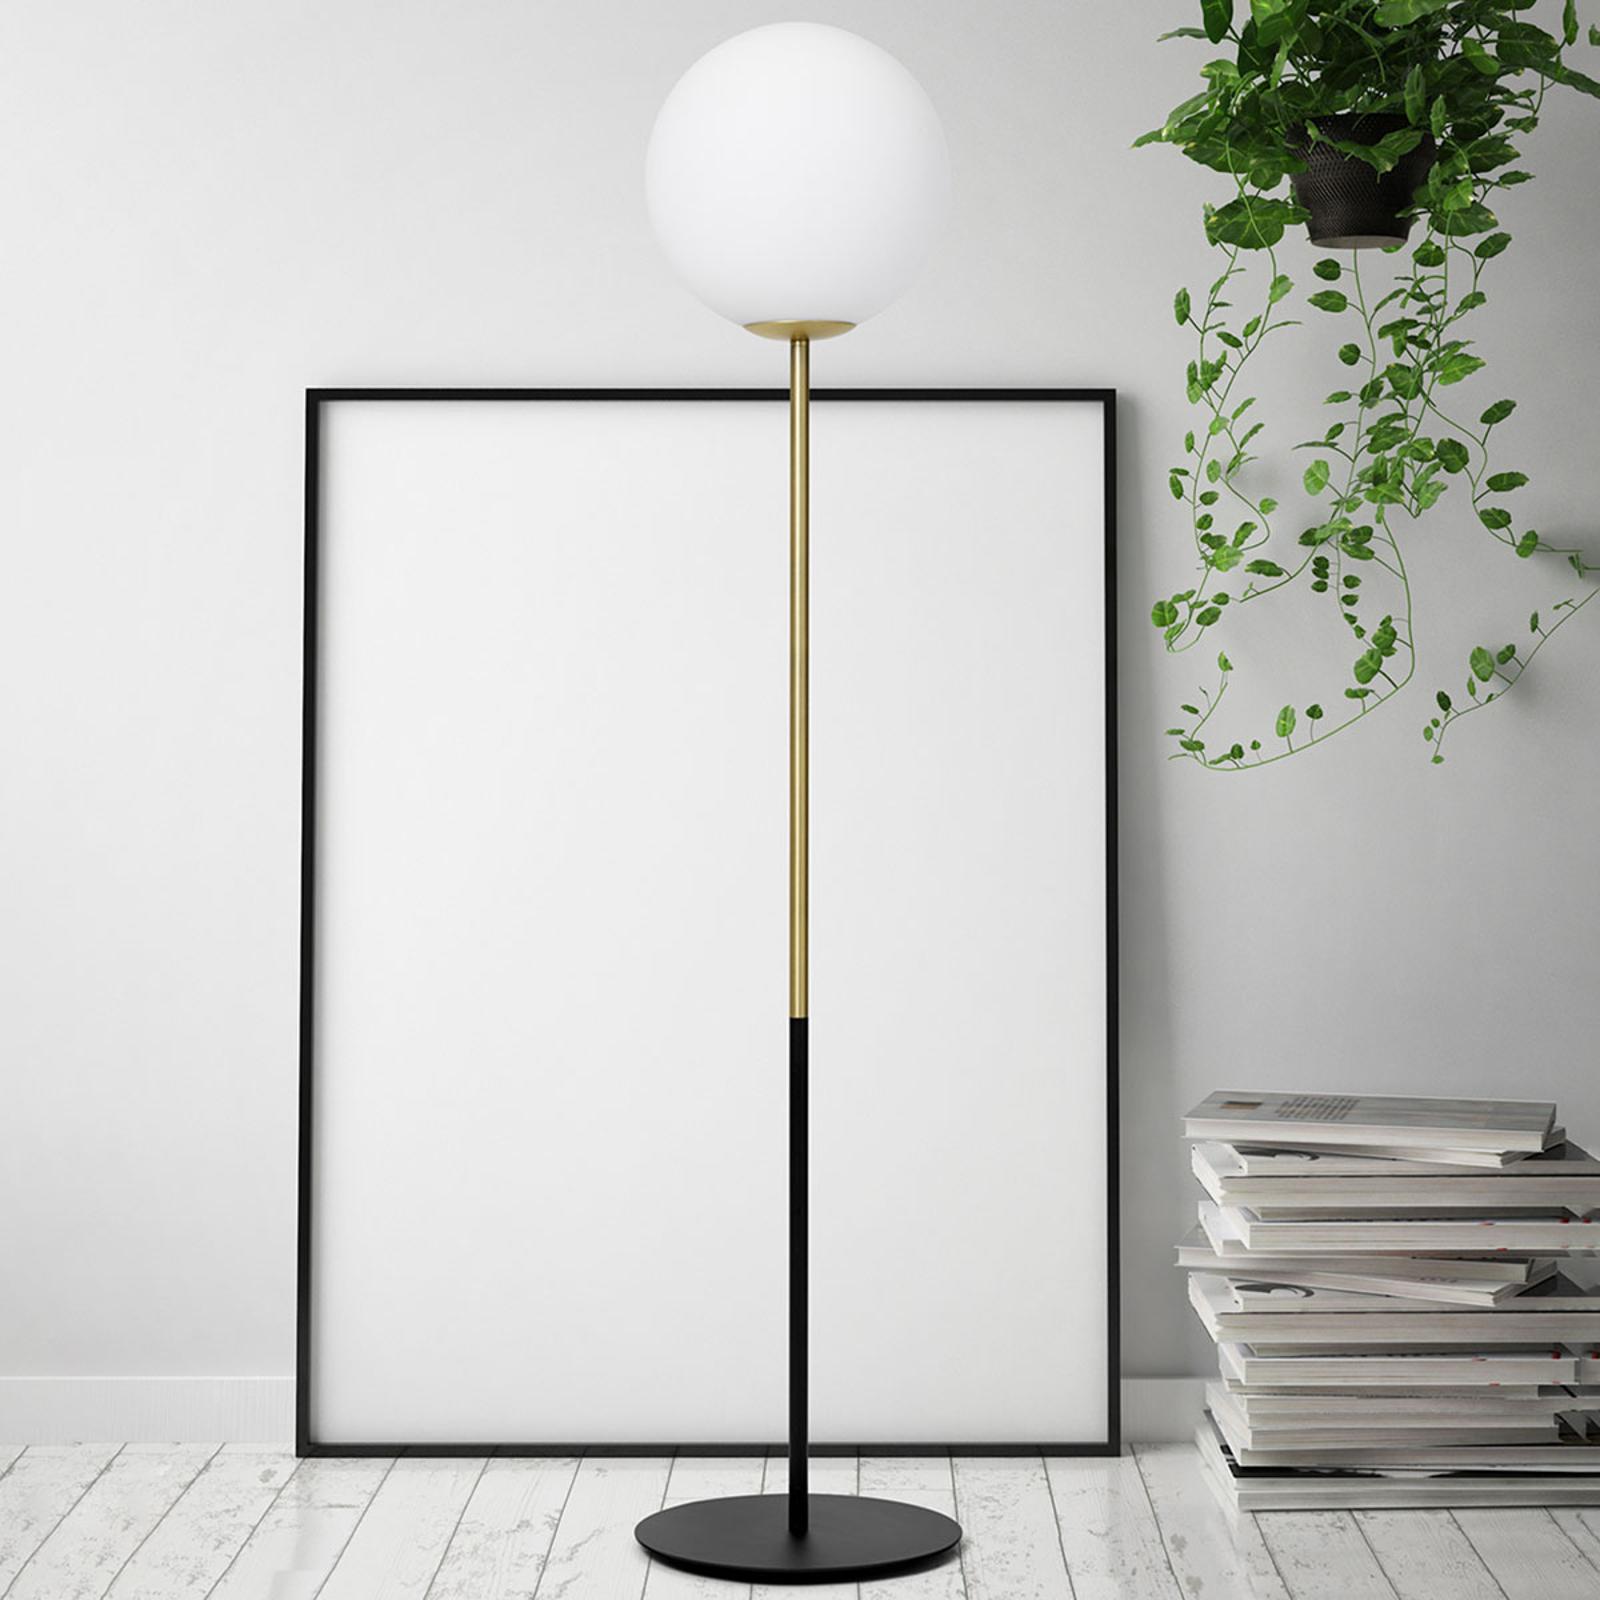 Messing-vloerlamp Jugen 1-lamp